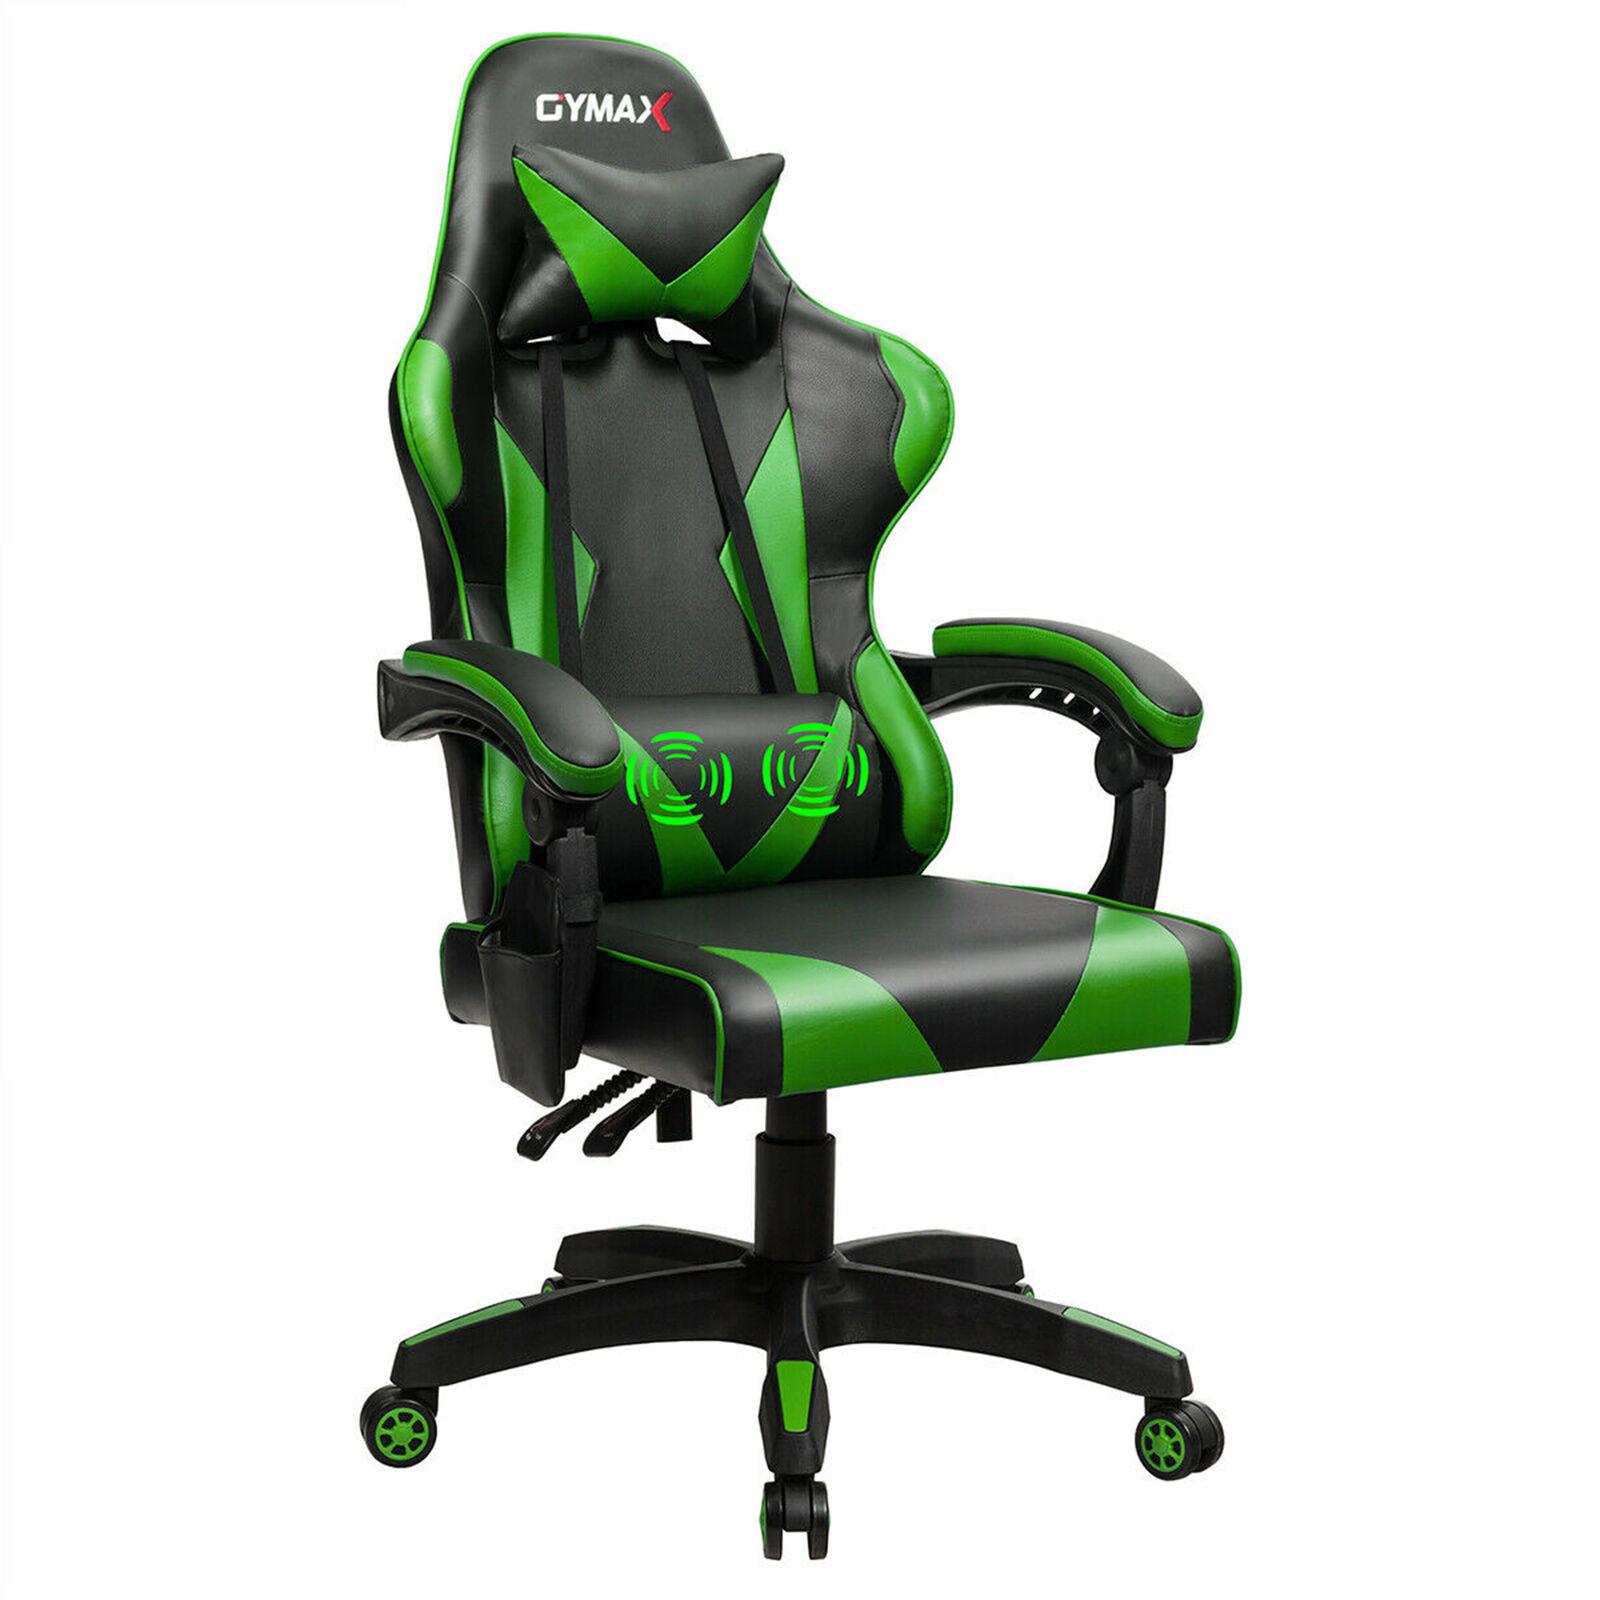 Gaming Chair Reclining Swivel Racing Office Chair w/Massage Lumbar Support Green